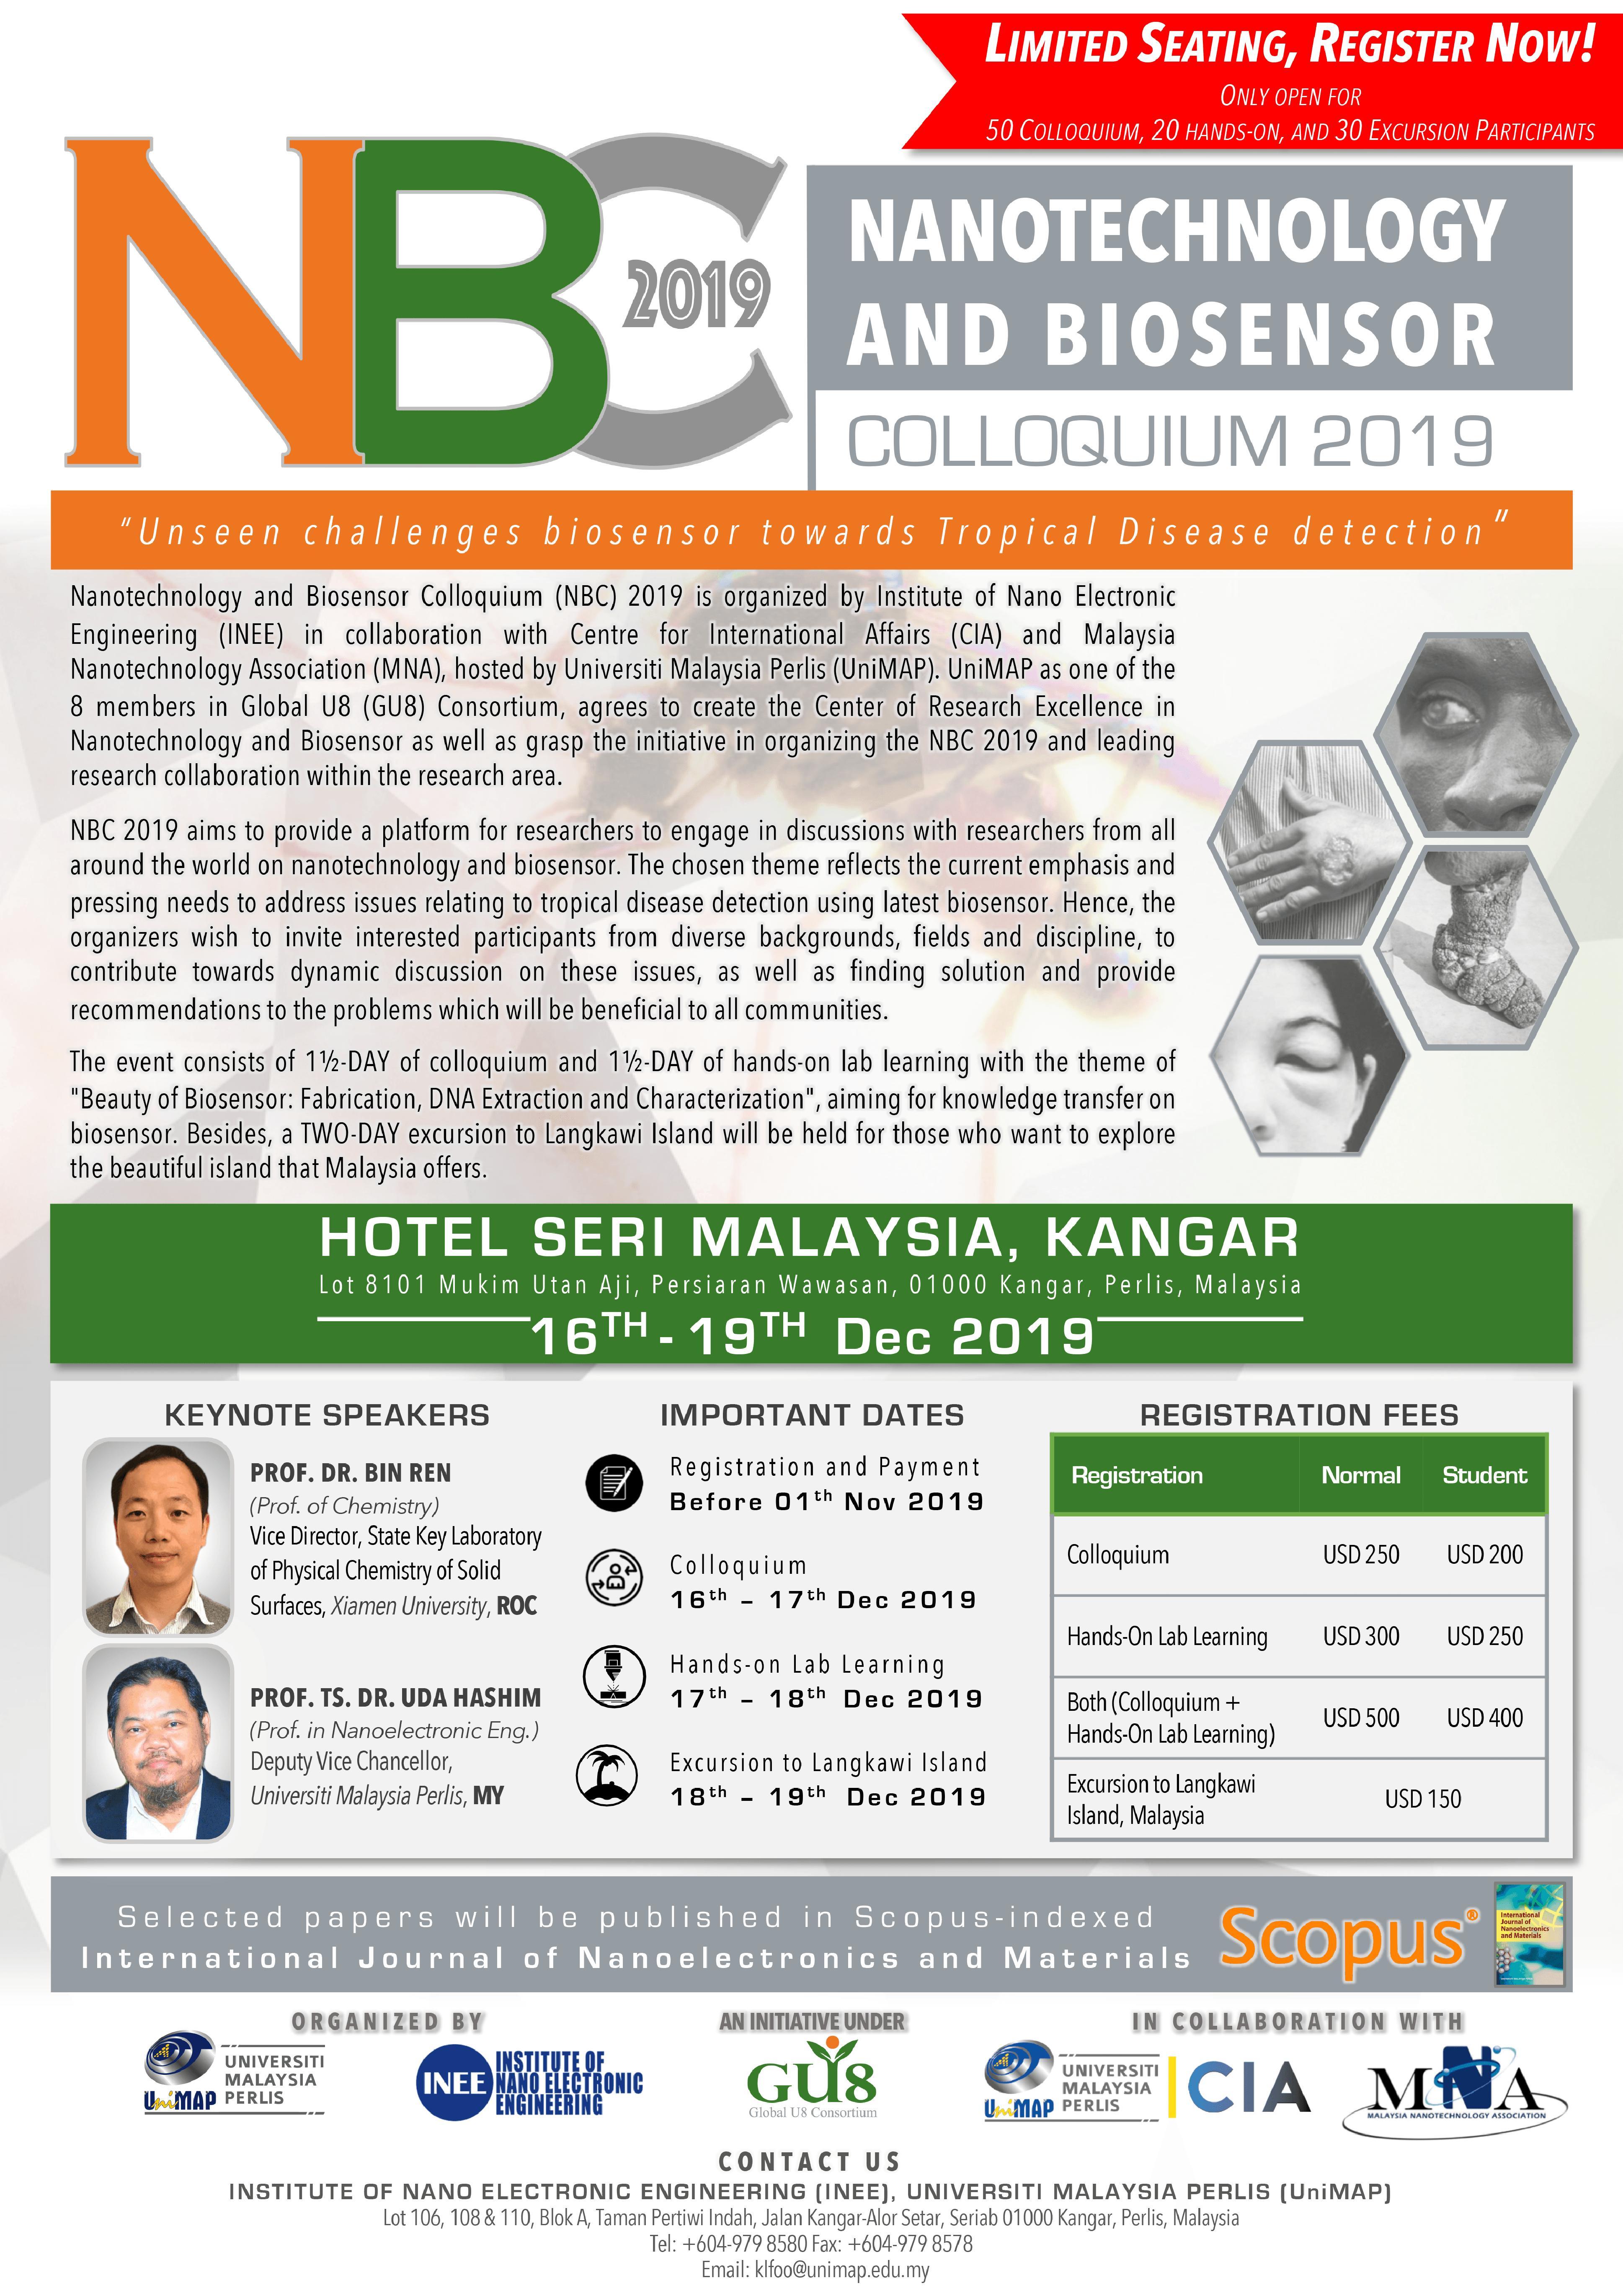 Nanotechnology and Biosensor Colloquium 2019